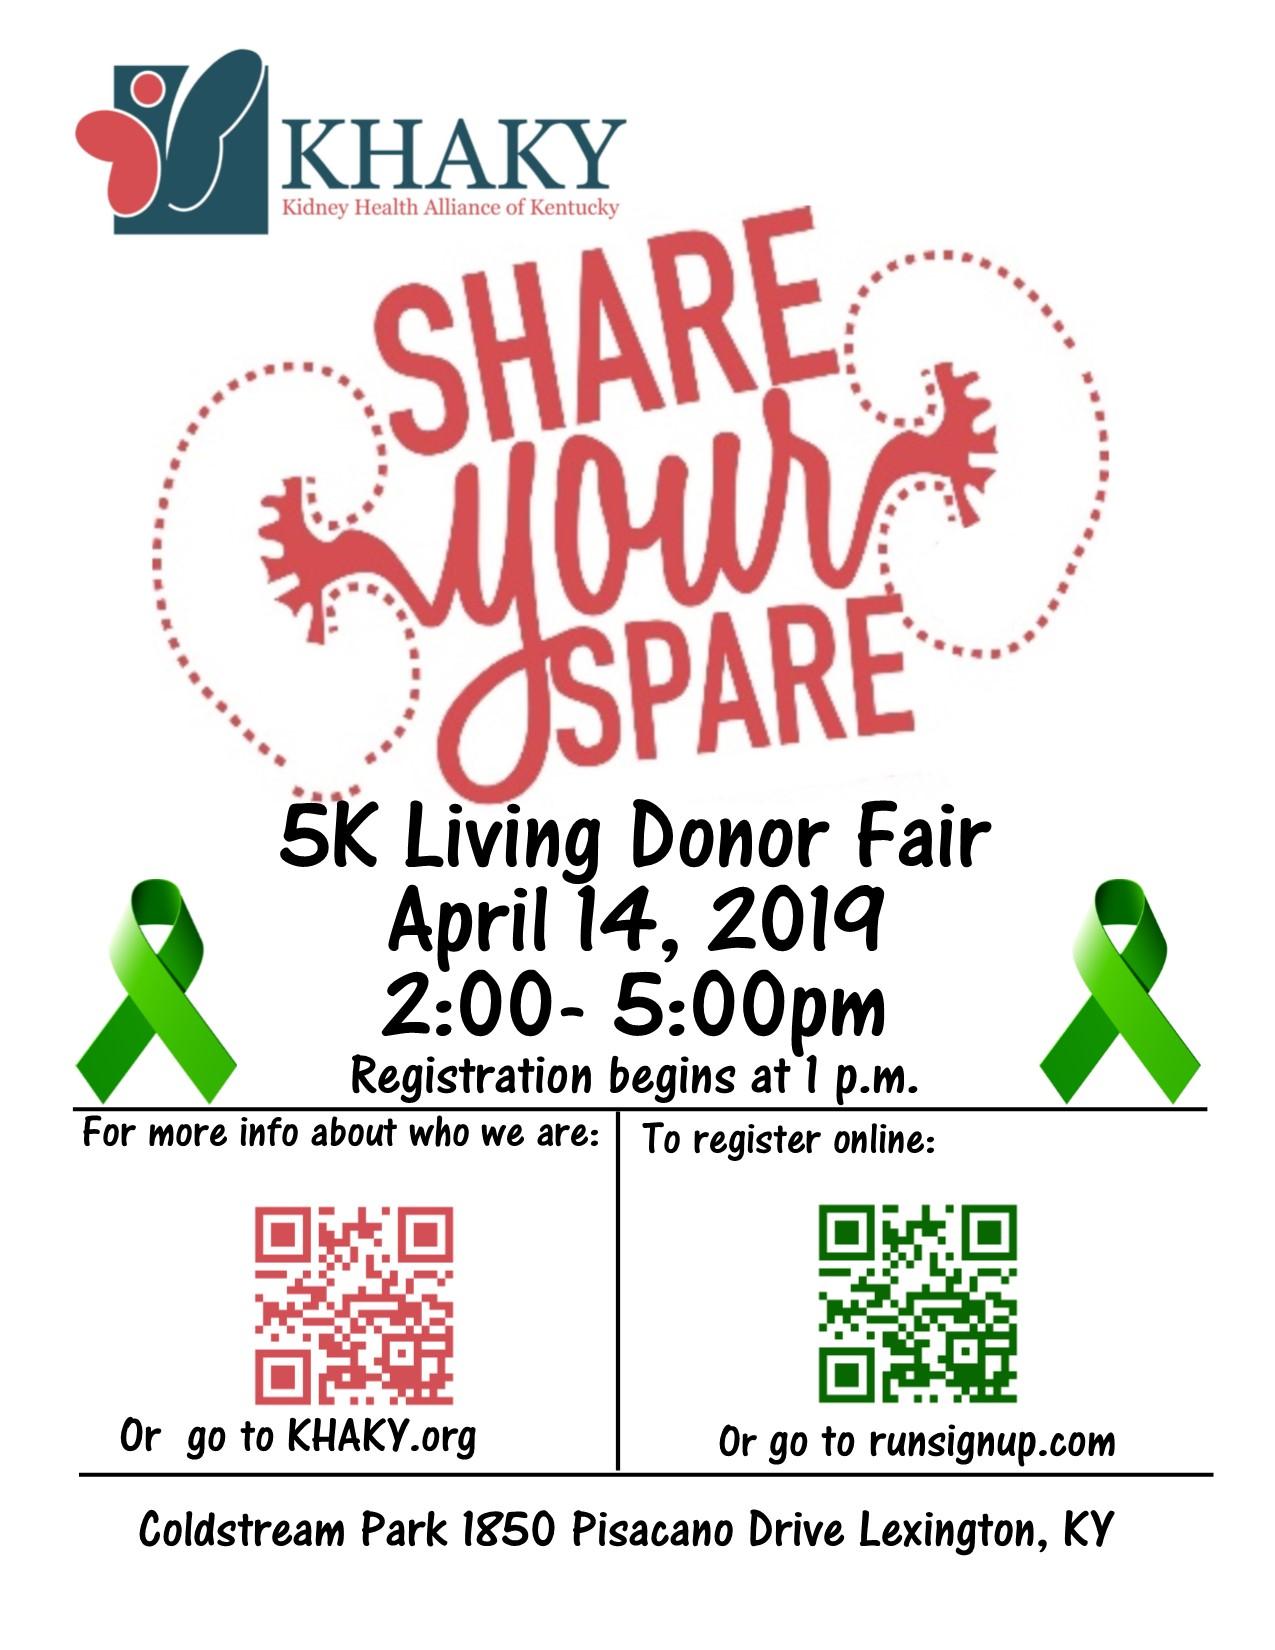 KHAKY Share Your Spare 5K & Living Donor Fair